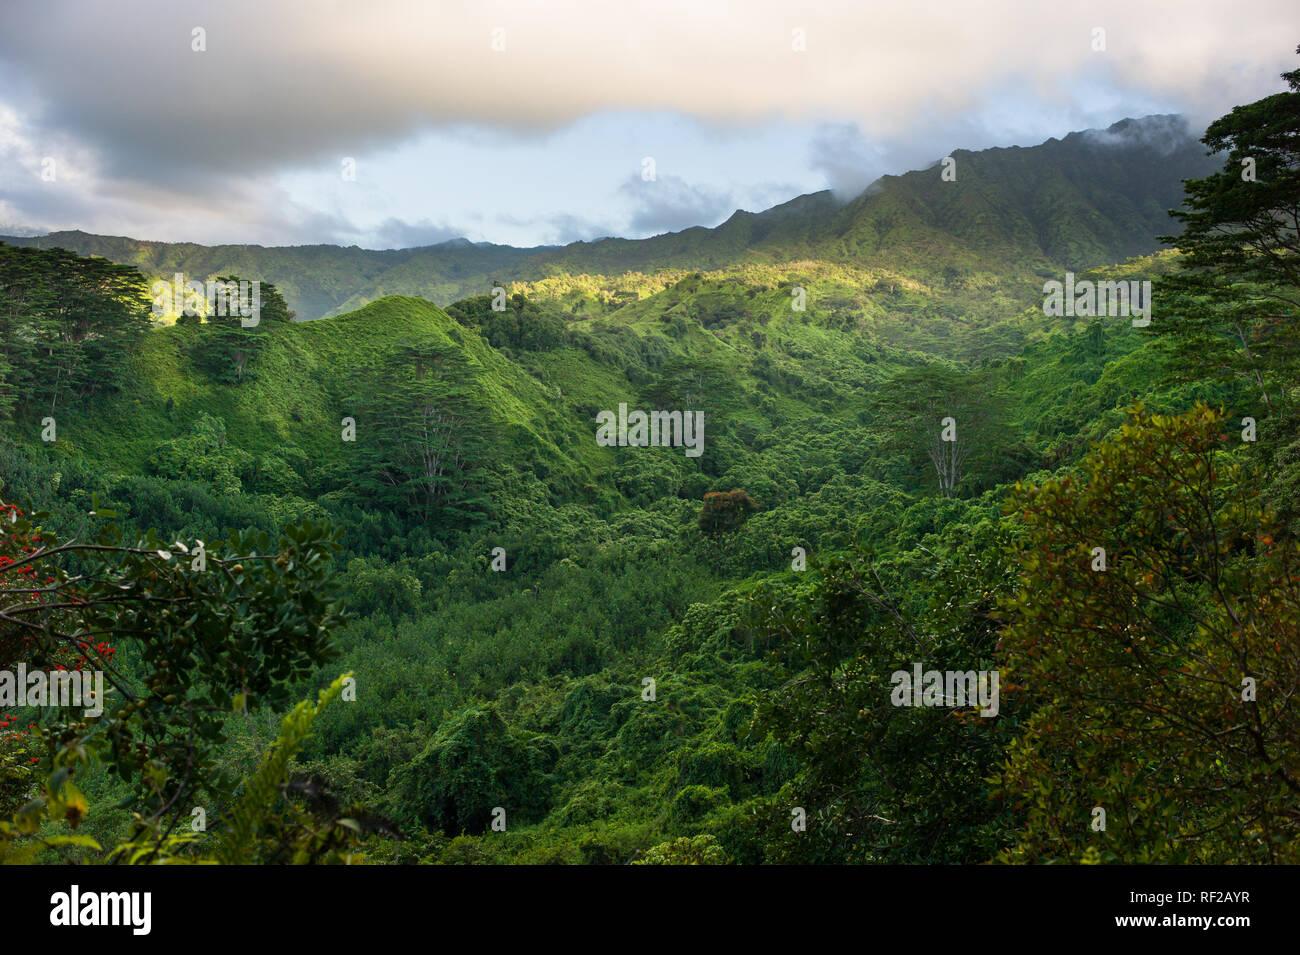 The Kuilau Ridge Trail explores Kauai's scenic mountainous interior in Hawaii, United States. - Stock Image